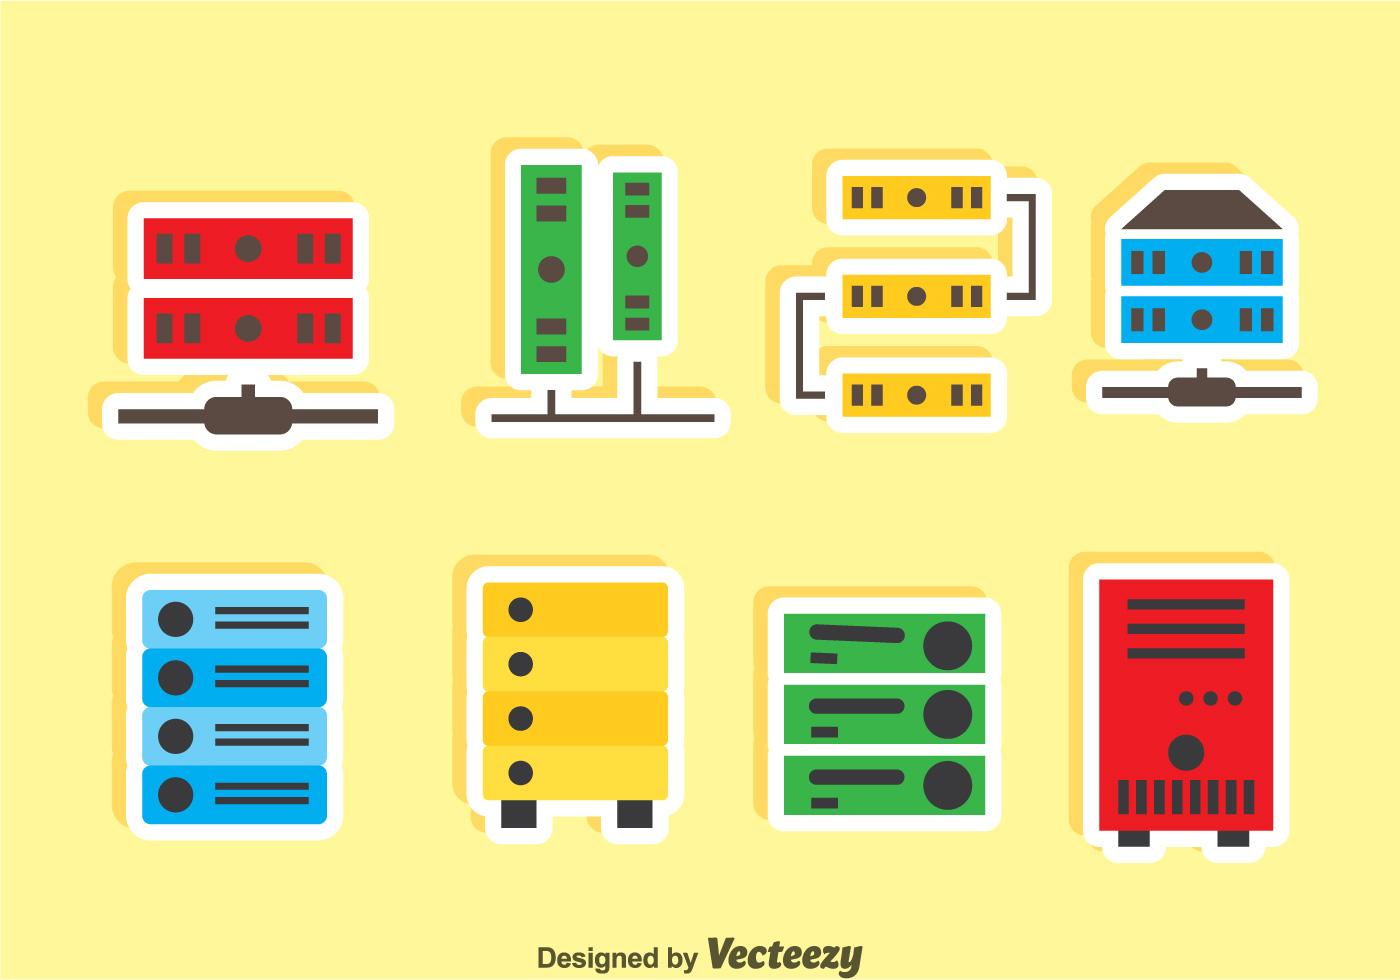 server rack icons vector - download free vector art, stock graphics